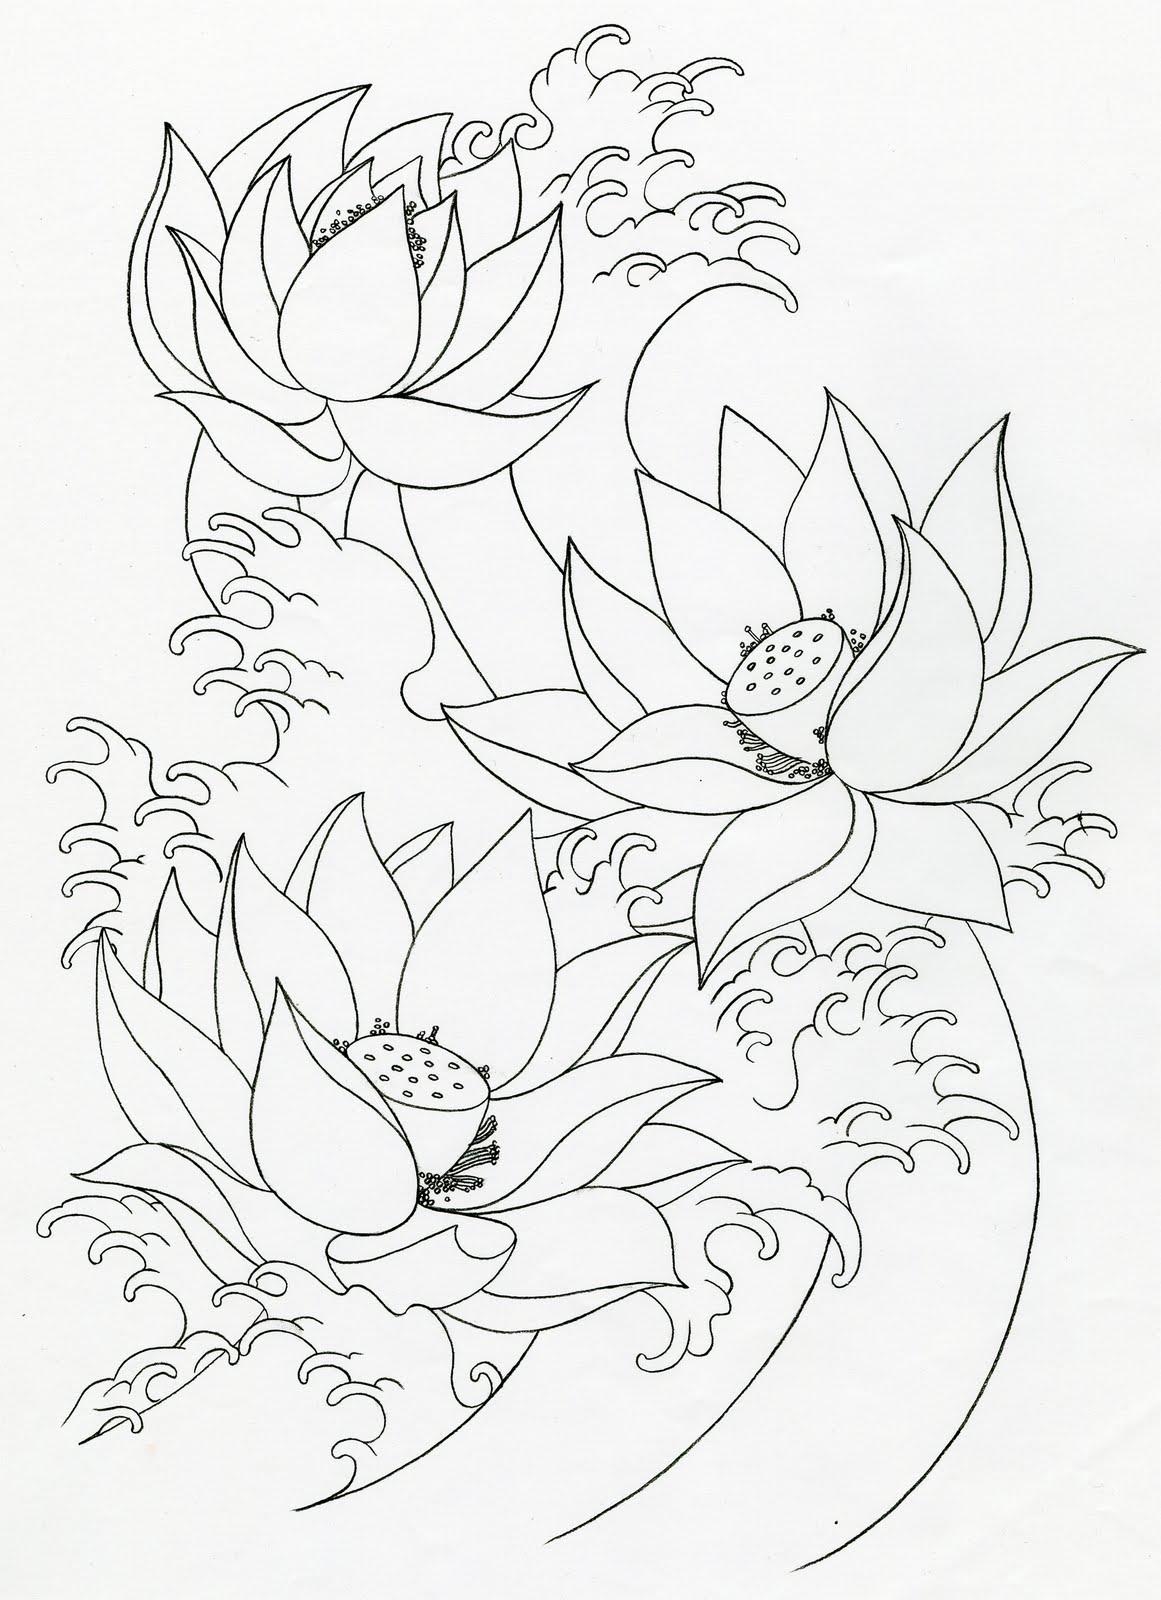 Mike's TATTOO design: Lotus